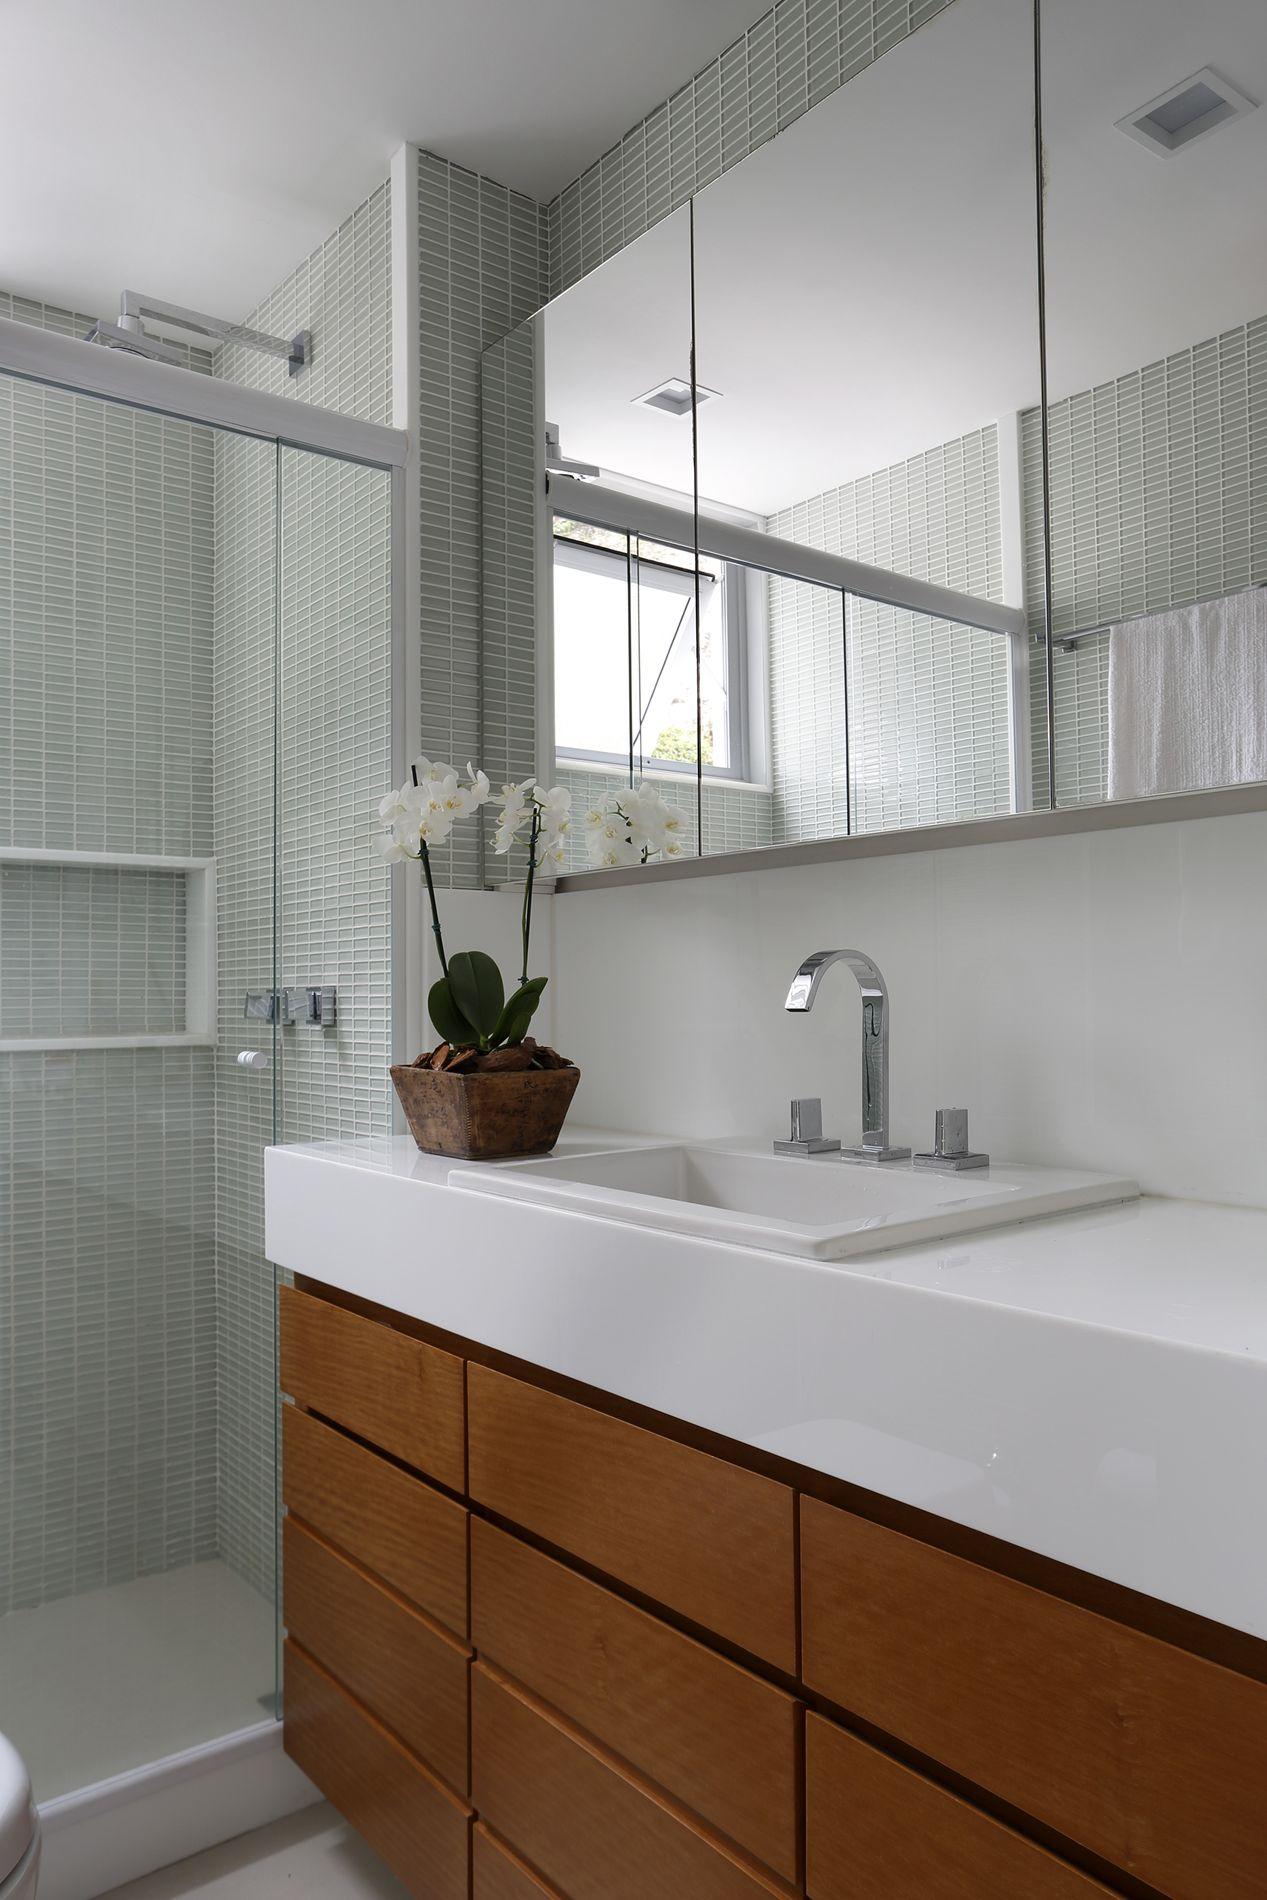 banheiros banheiros banheiros banheiros banheiros banheiros banheiros  #603718 1267 1900